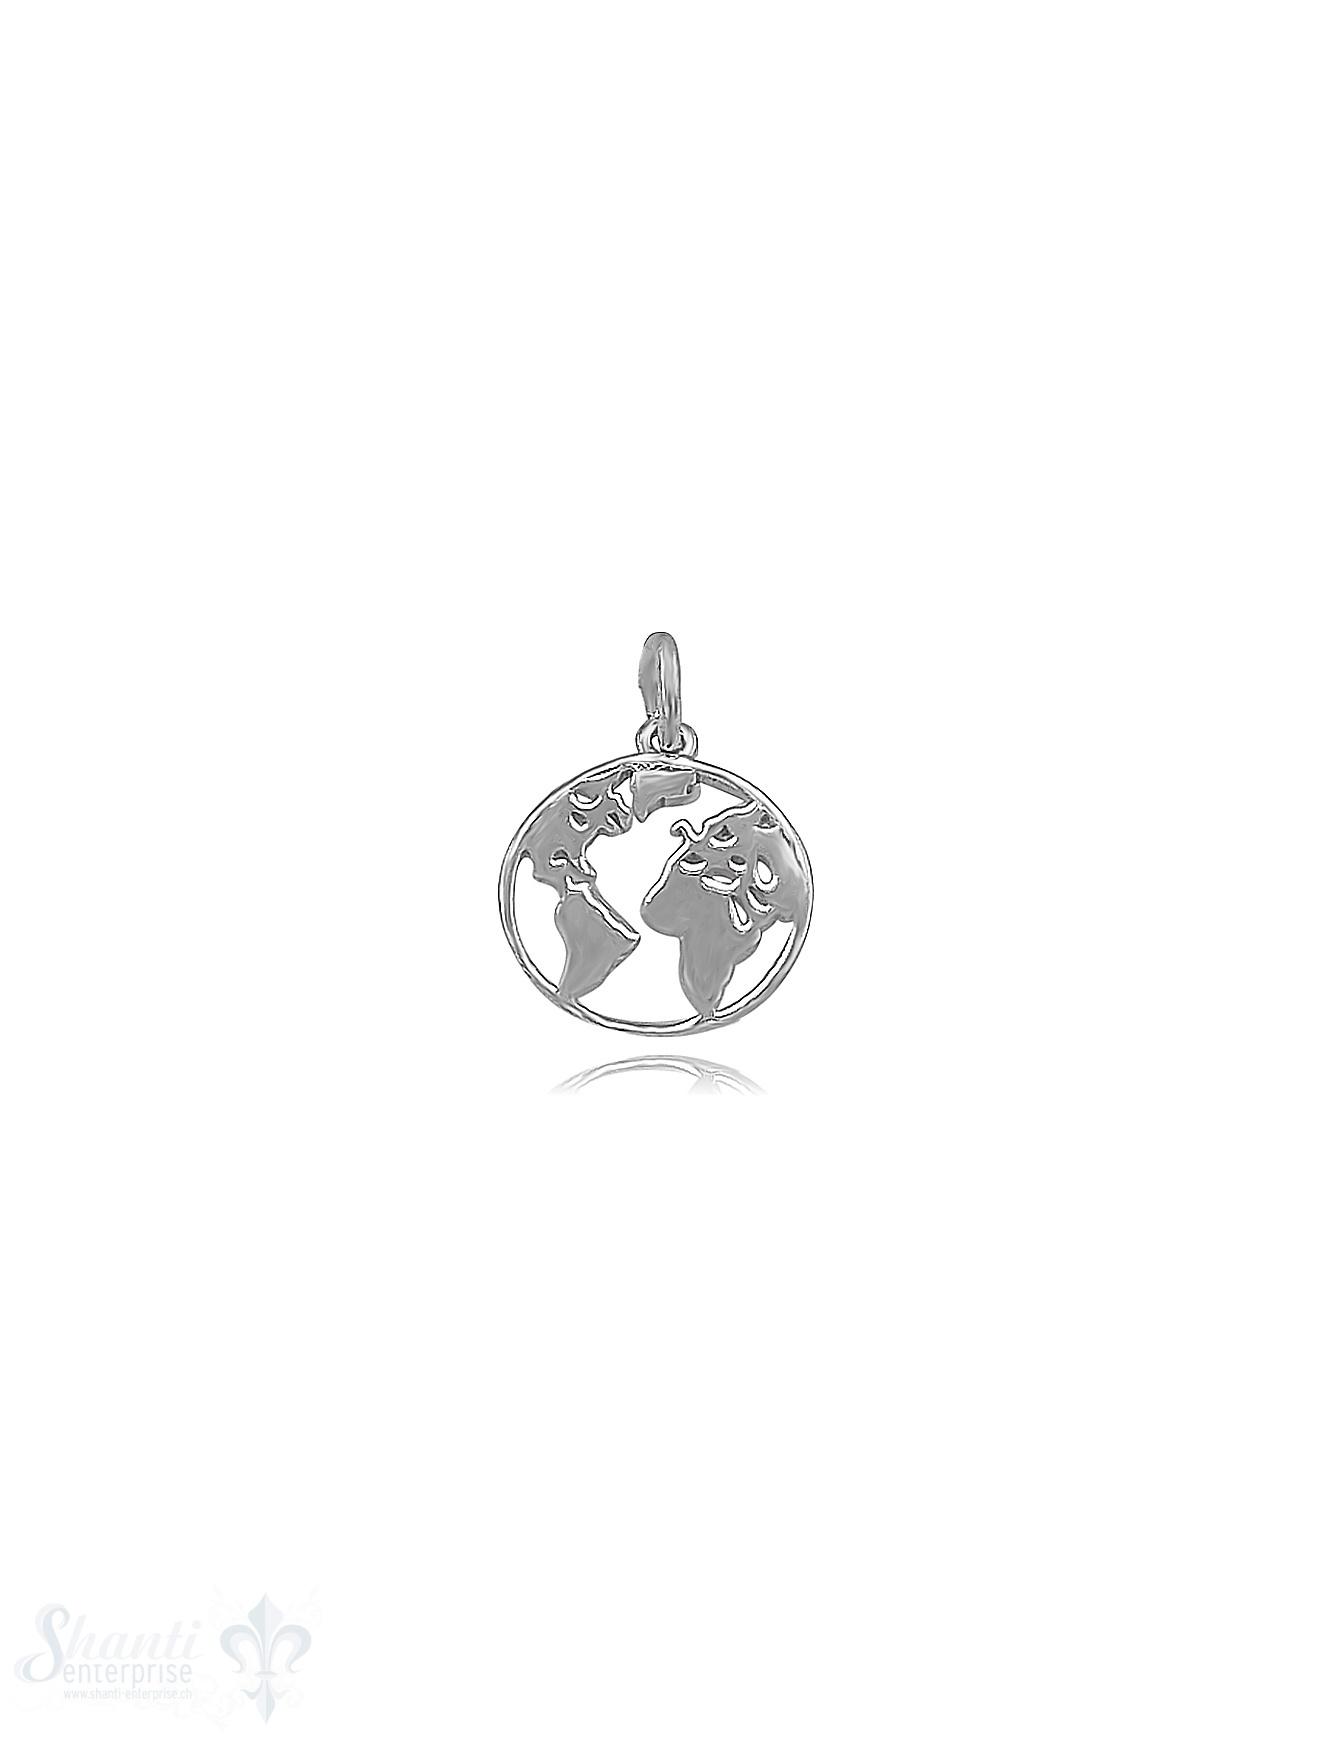 Anhänger Silber Weltkugel im Kreis 12 mm poliert